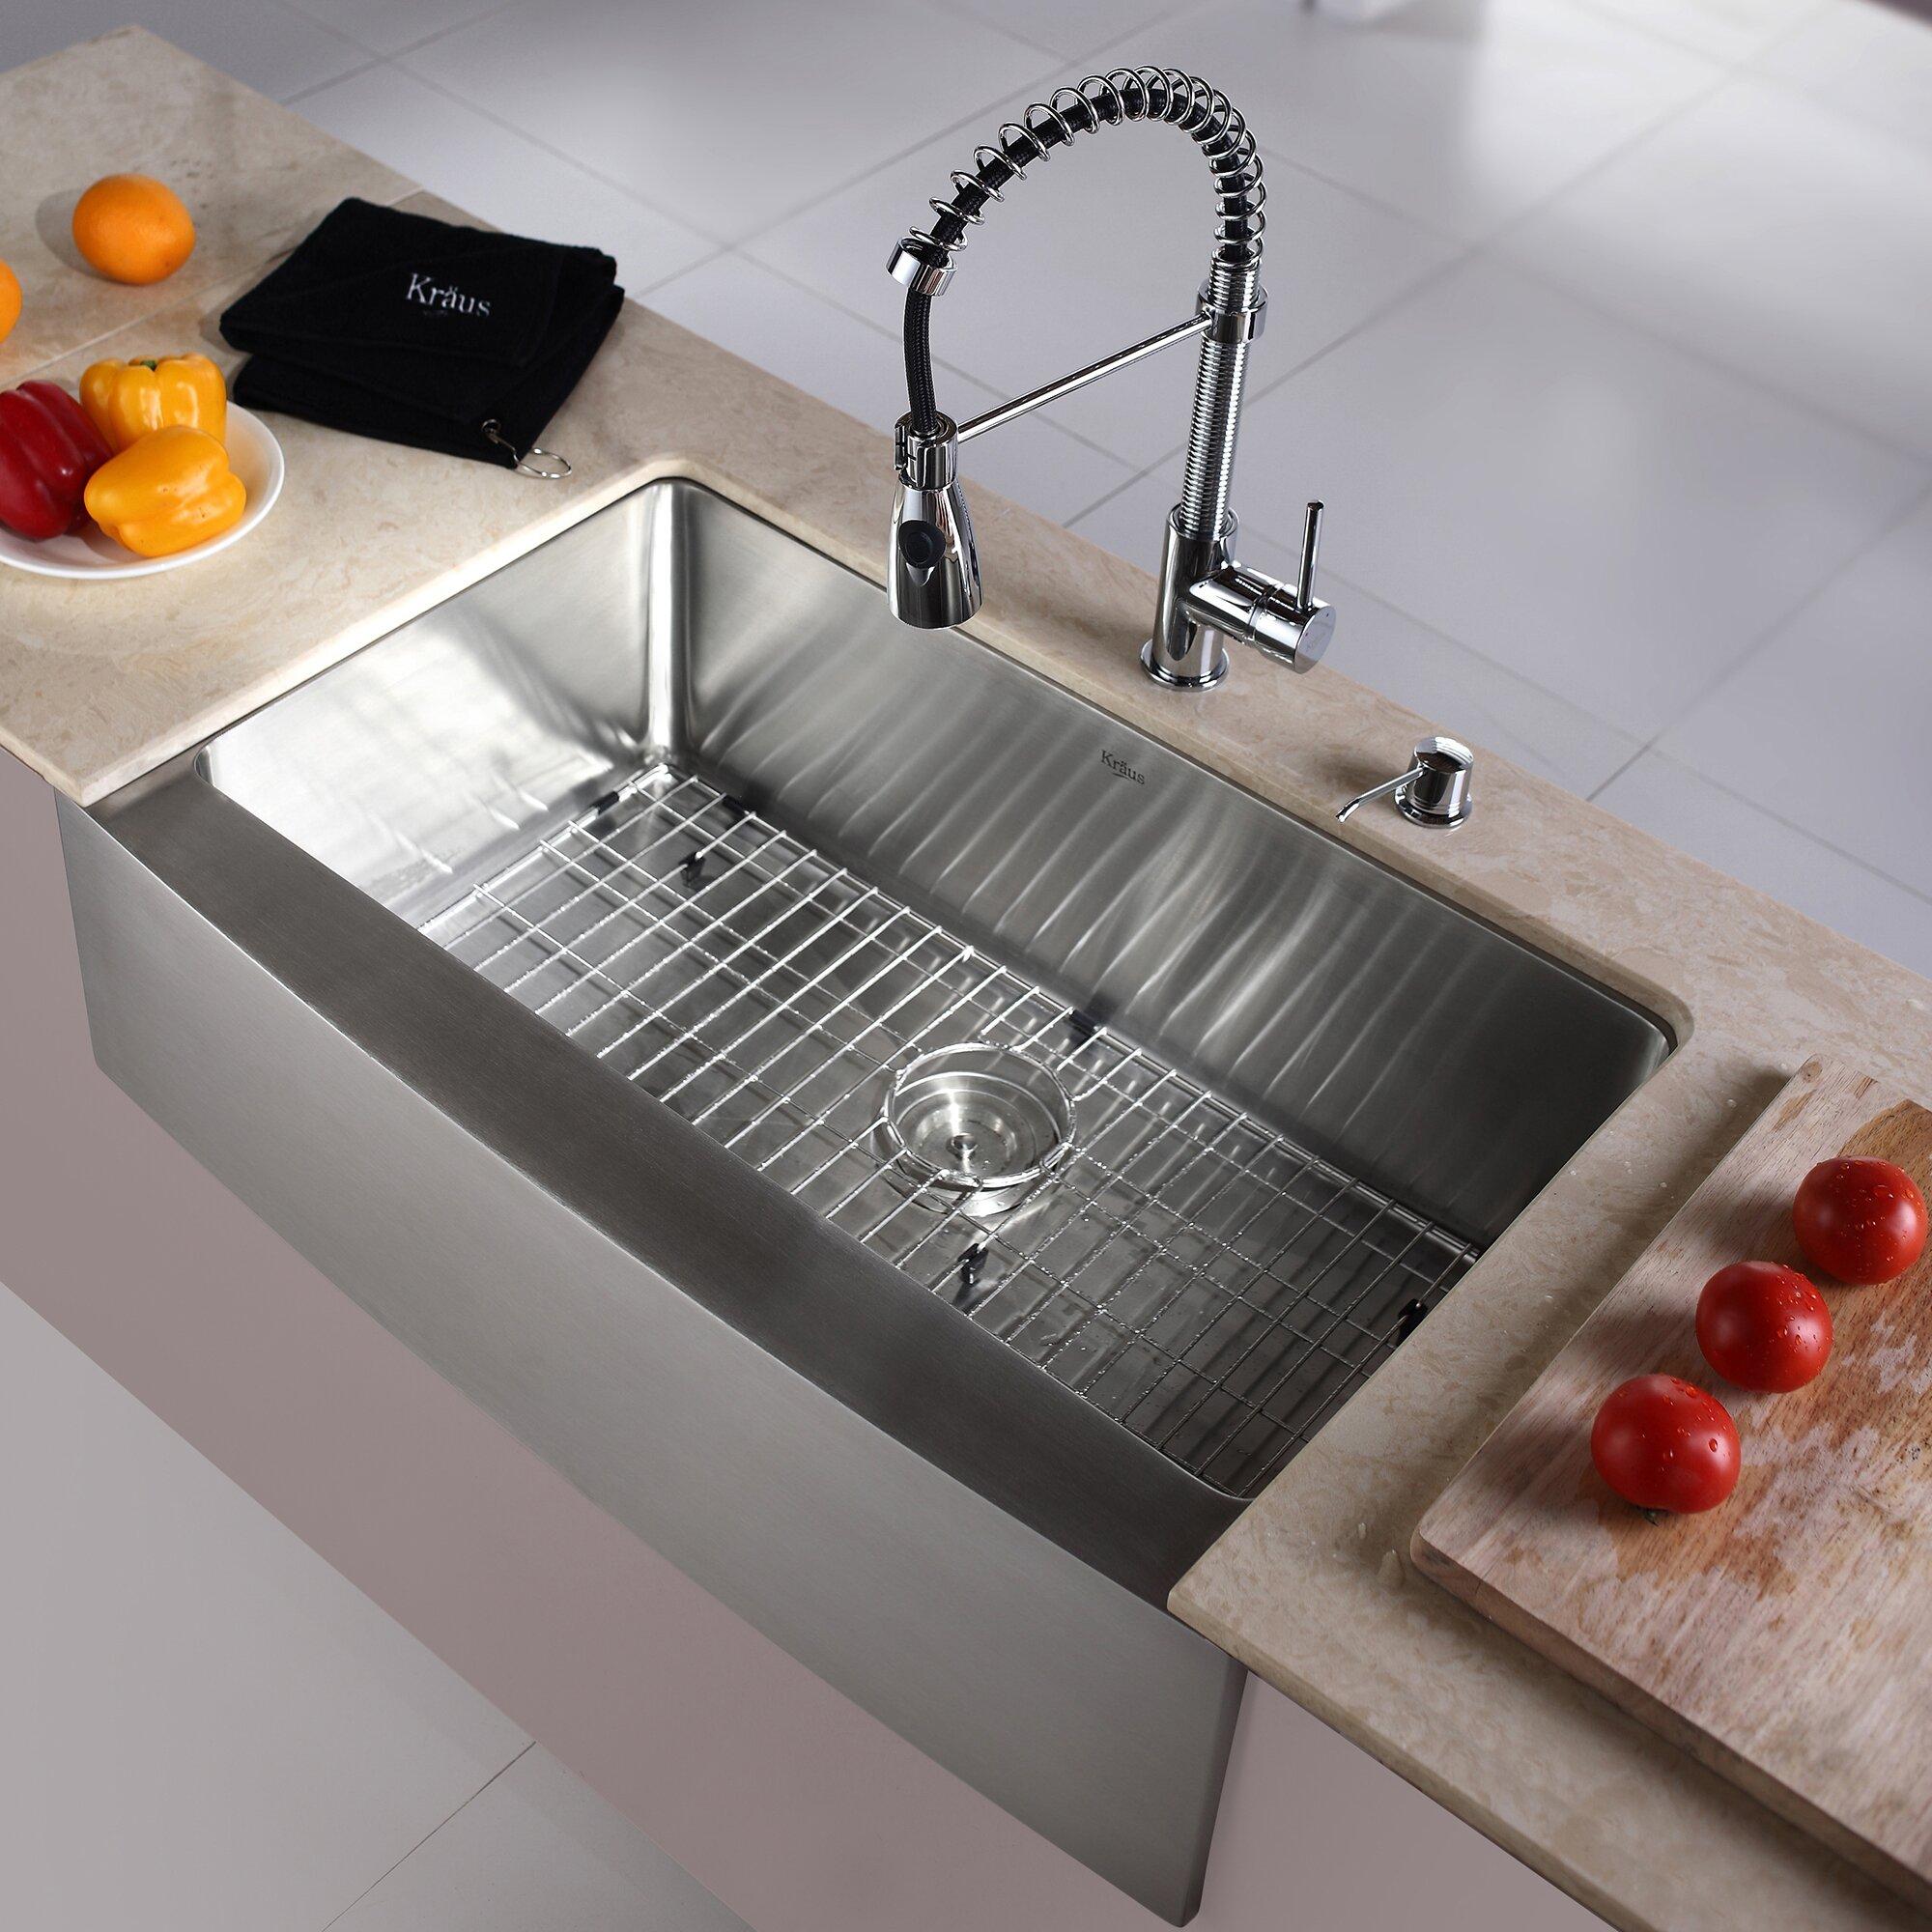 delightful Kraus Kitchen Sink #9: Kraus Kitchen Combo 33u0026quot; x 21u0026quot; Single Basin Farmhouse/Apron Kitchen  Sink with